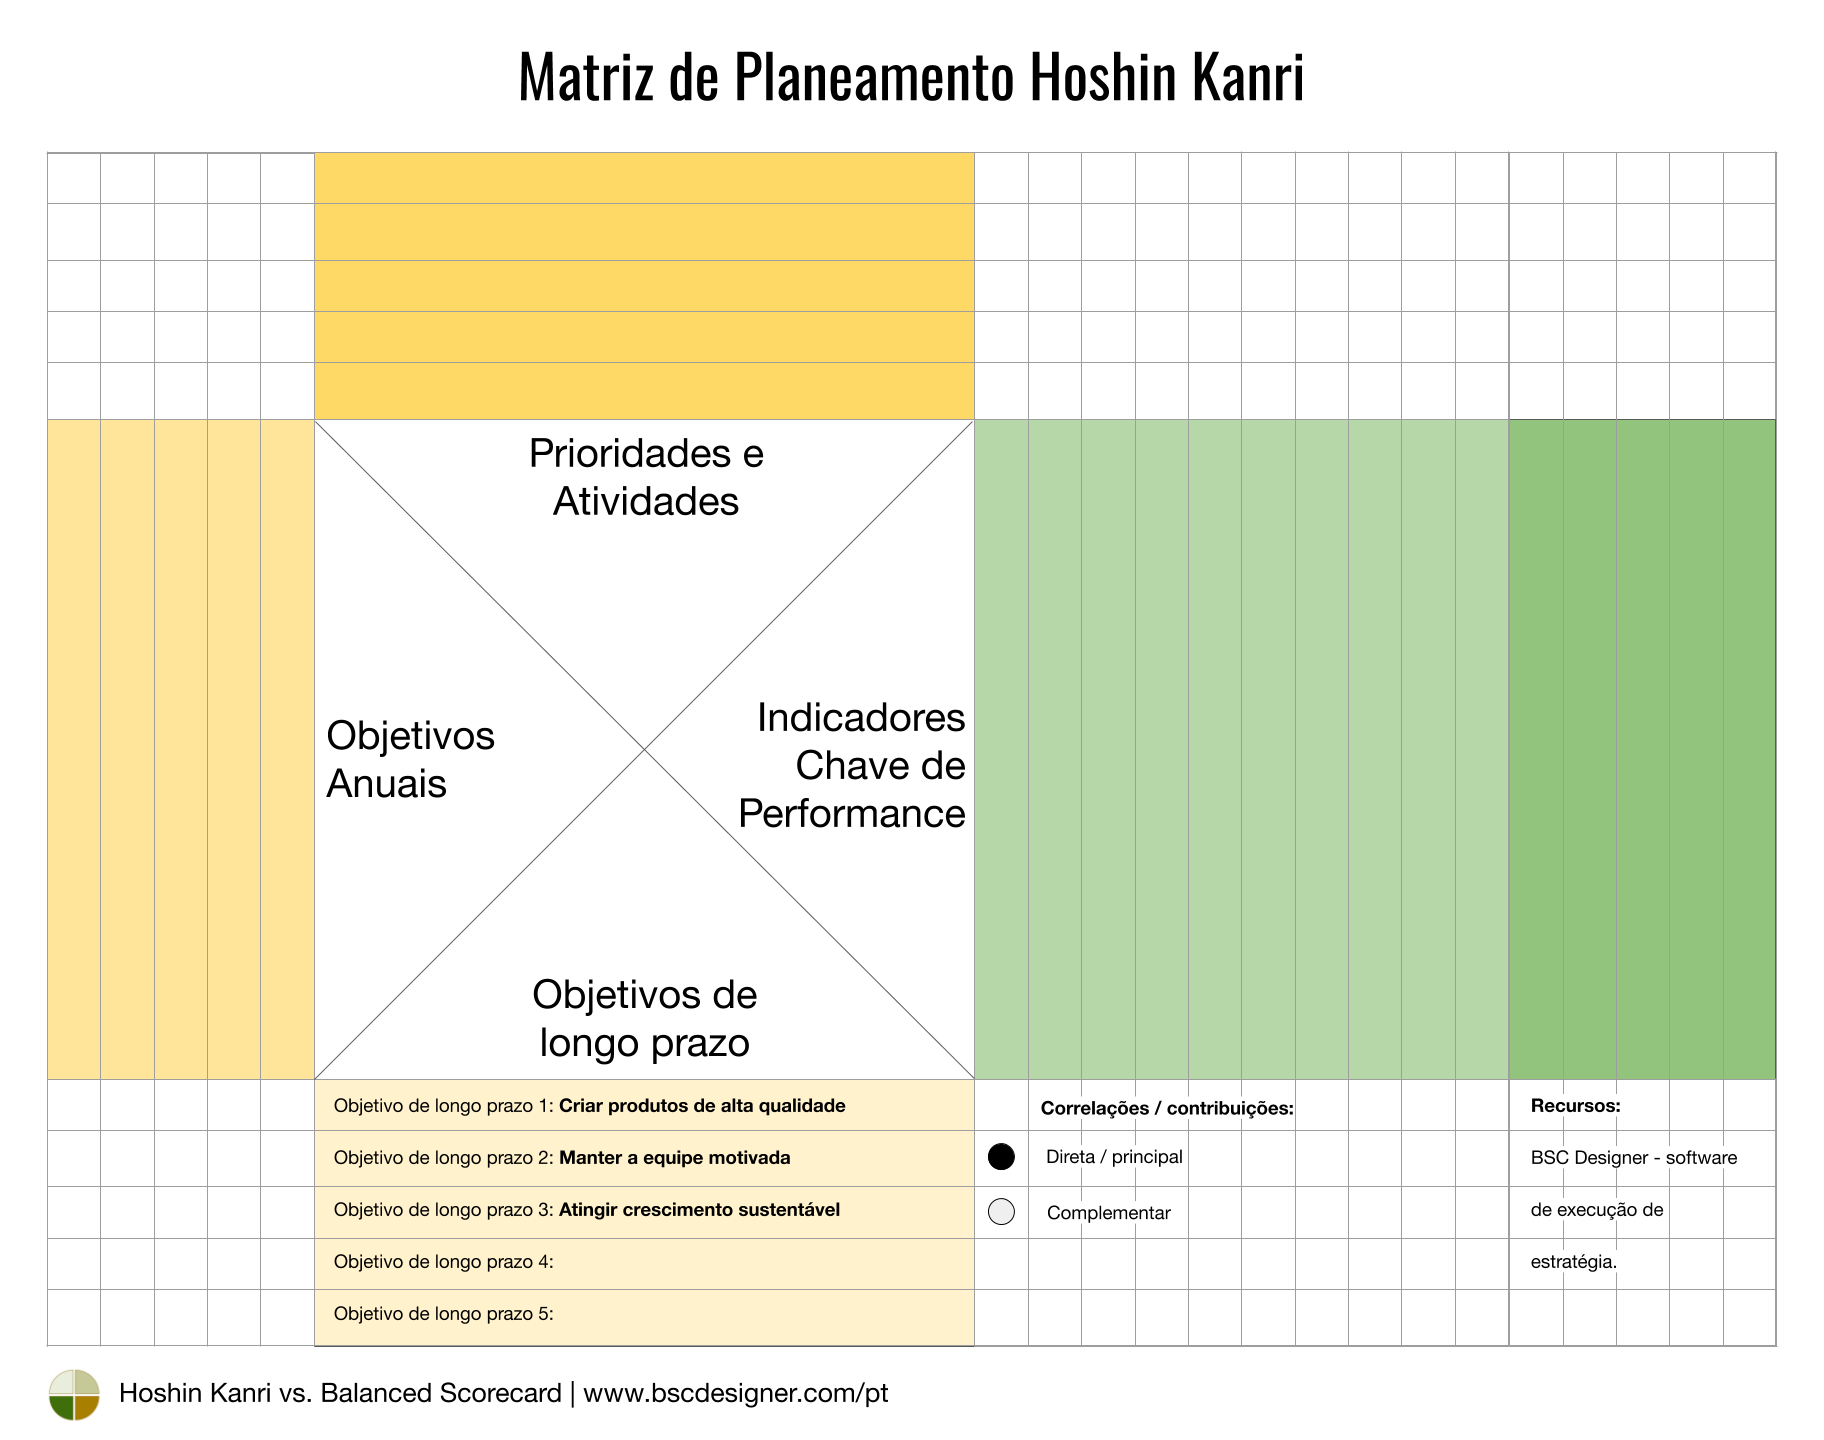 Matriz Hoshin Kanri - Objetivos a longo prazo